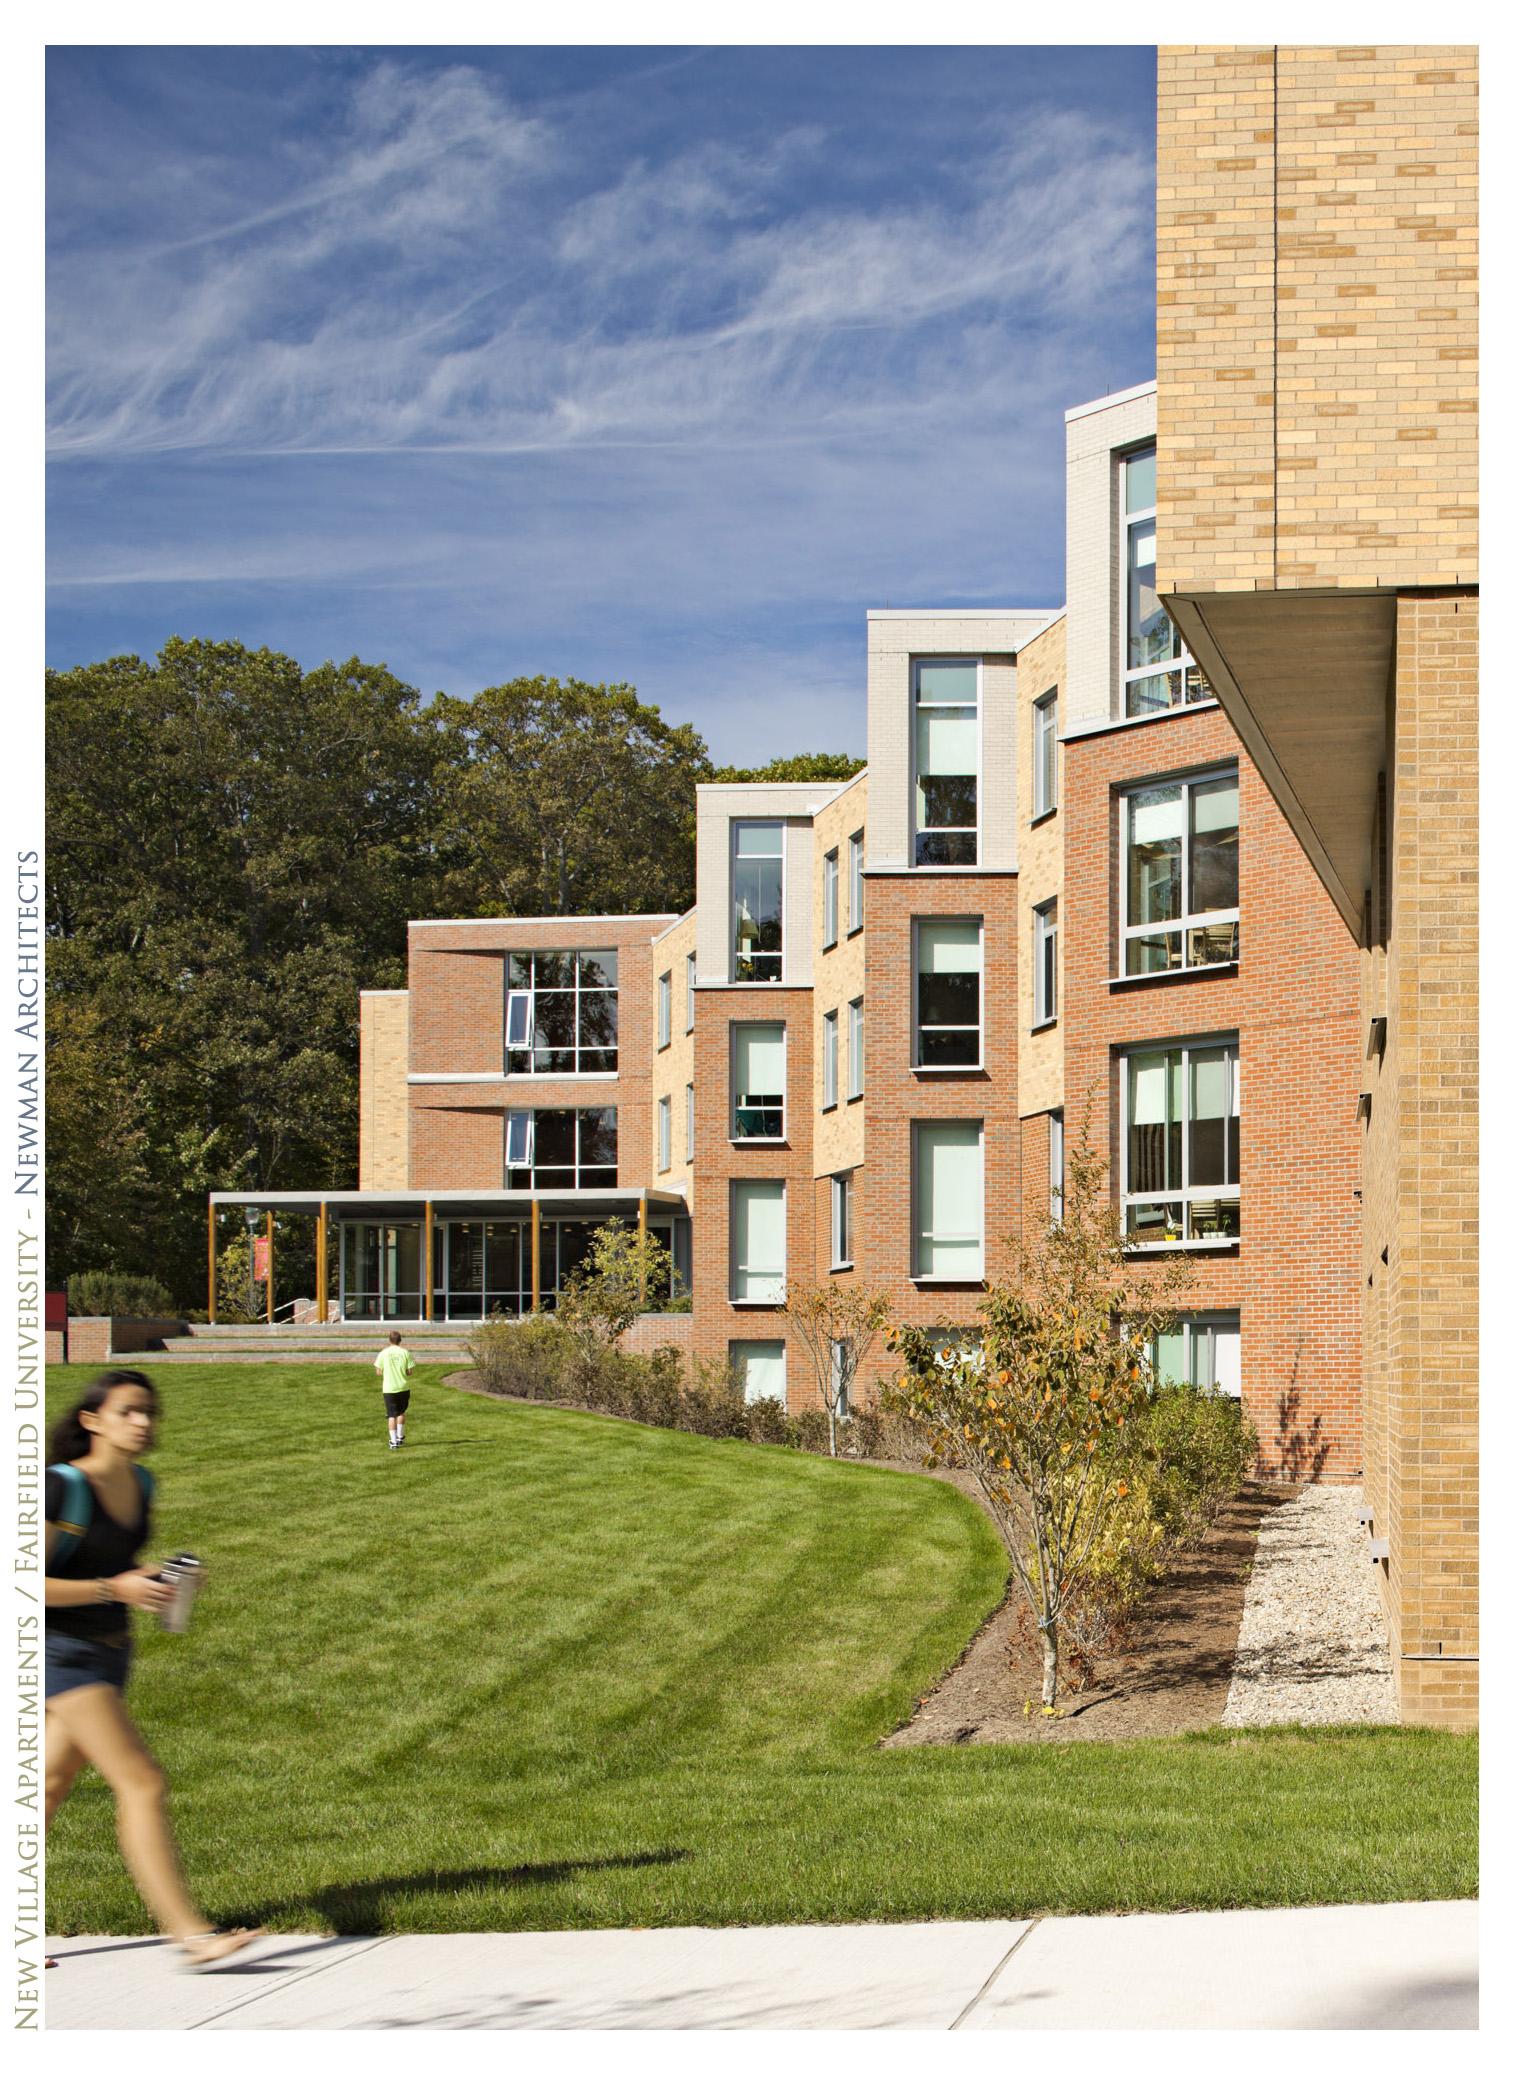 037_Robert-Benson-Photography-New-Village-Apartments-Fairfield-University-10.JPG